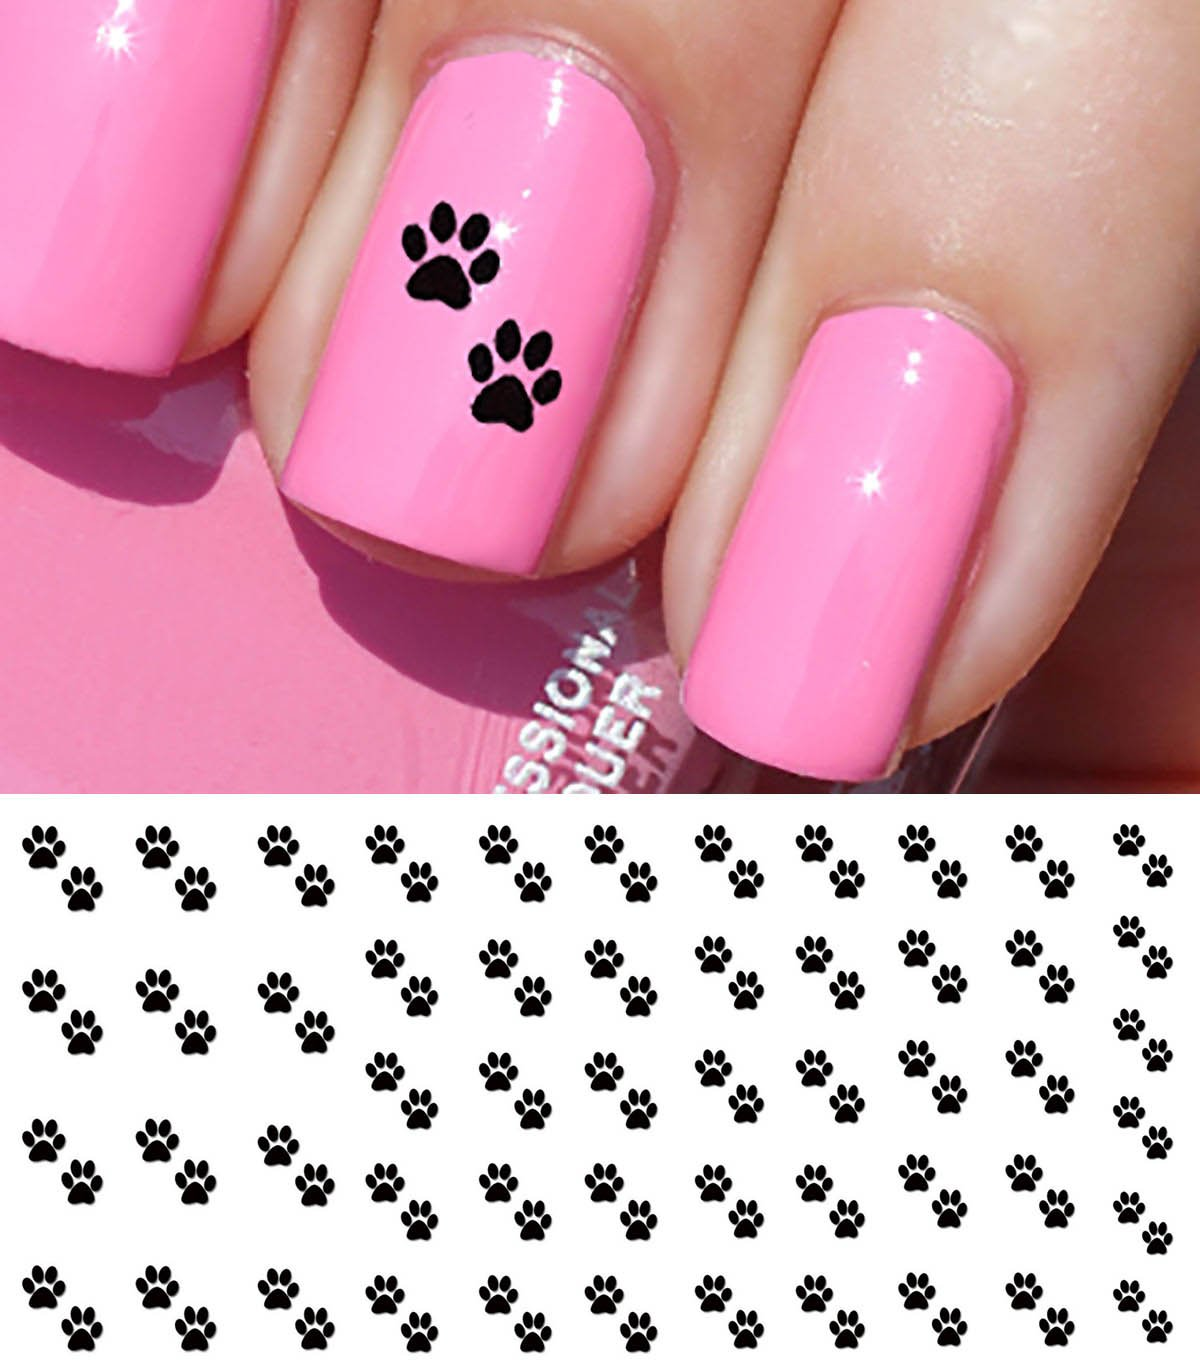 Amazon.com: I Love My Dog Paw Prints Water Slide Nail Art Decals ...